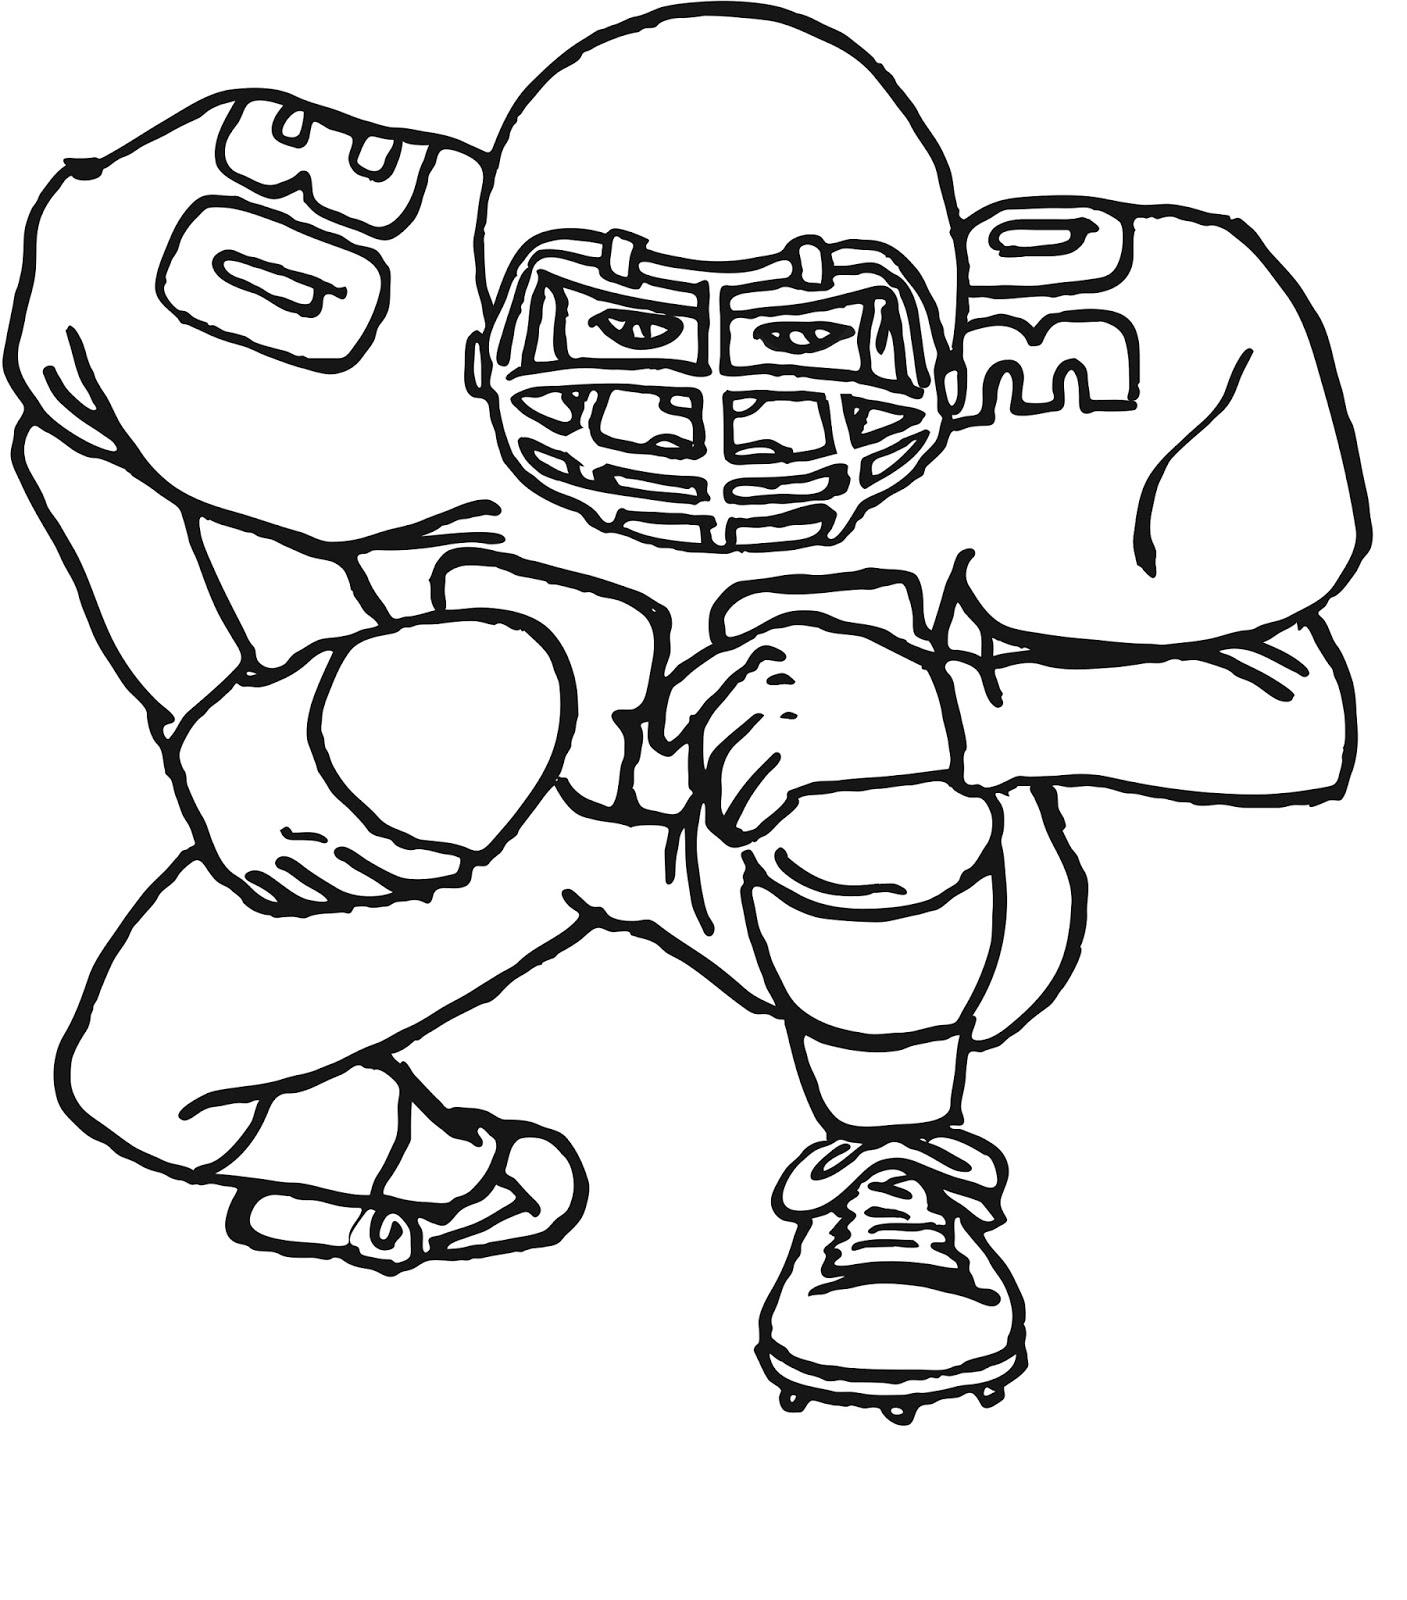 Football Coloring Pages Kids Should Have Five Facts | karena mereka ...